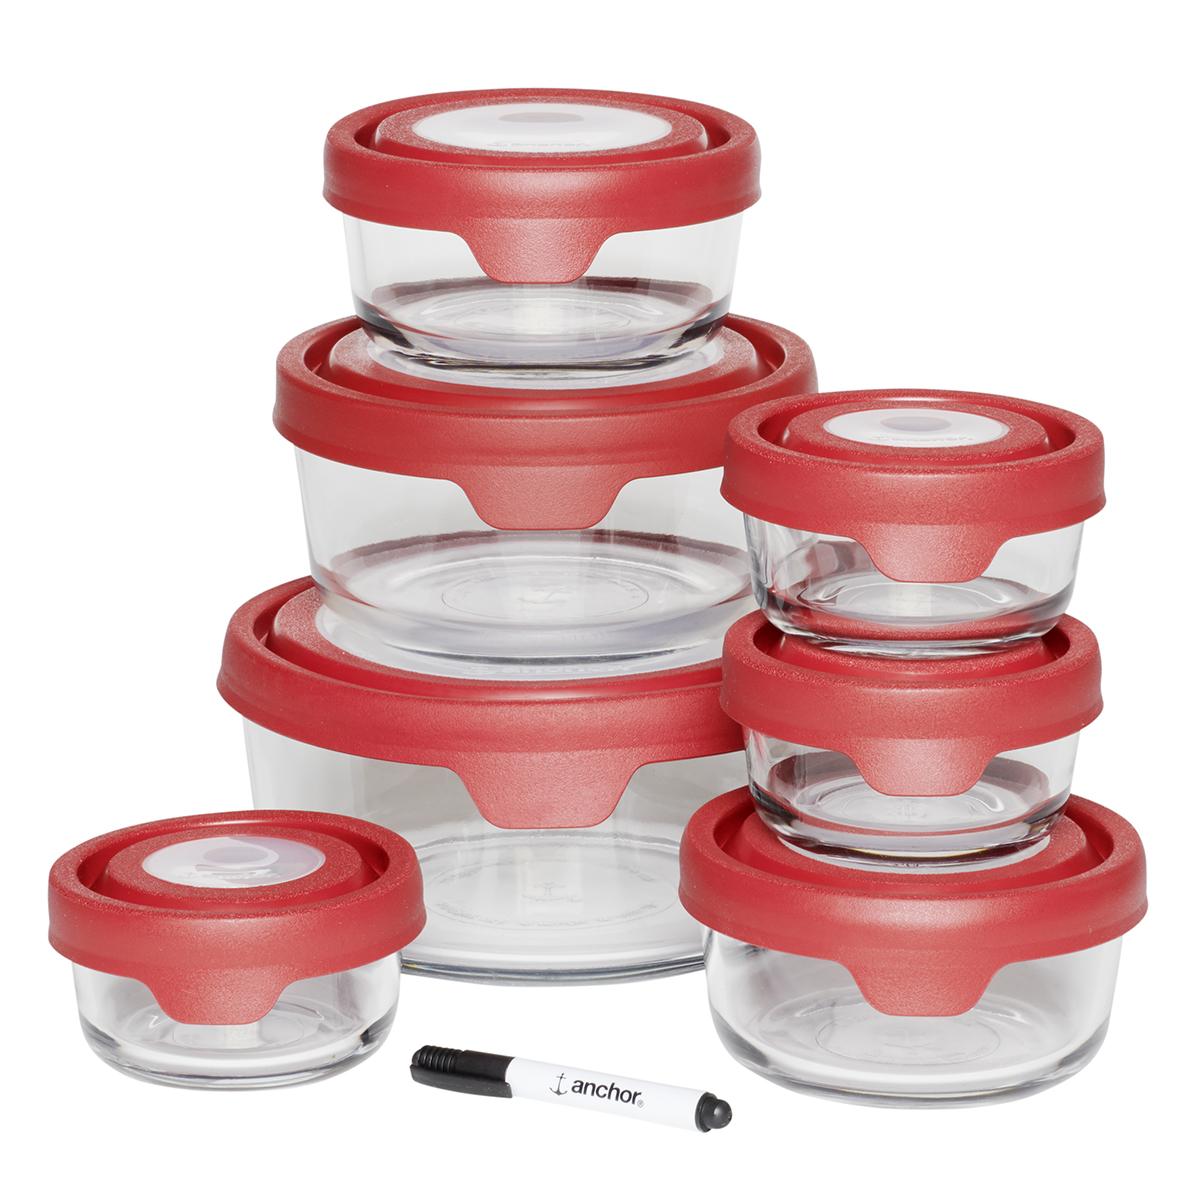 15 Pc. Food Storage Set